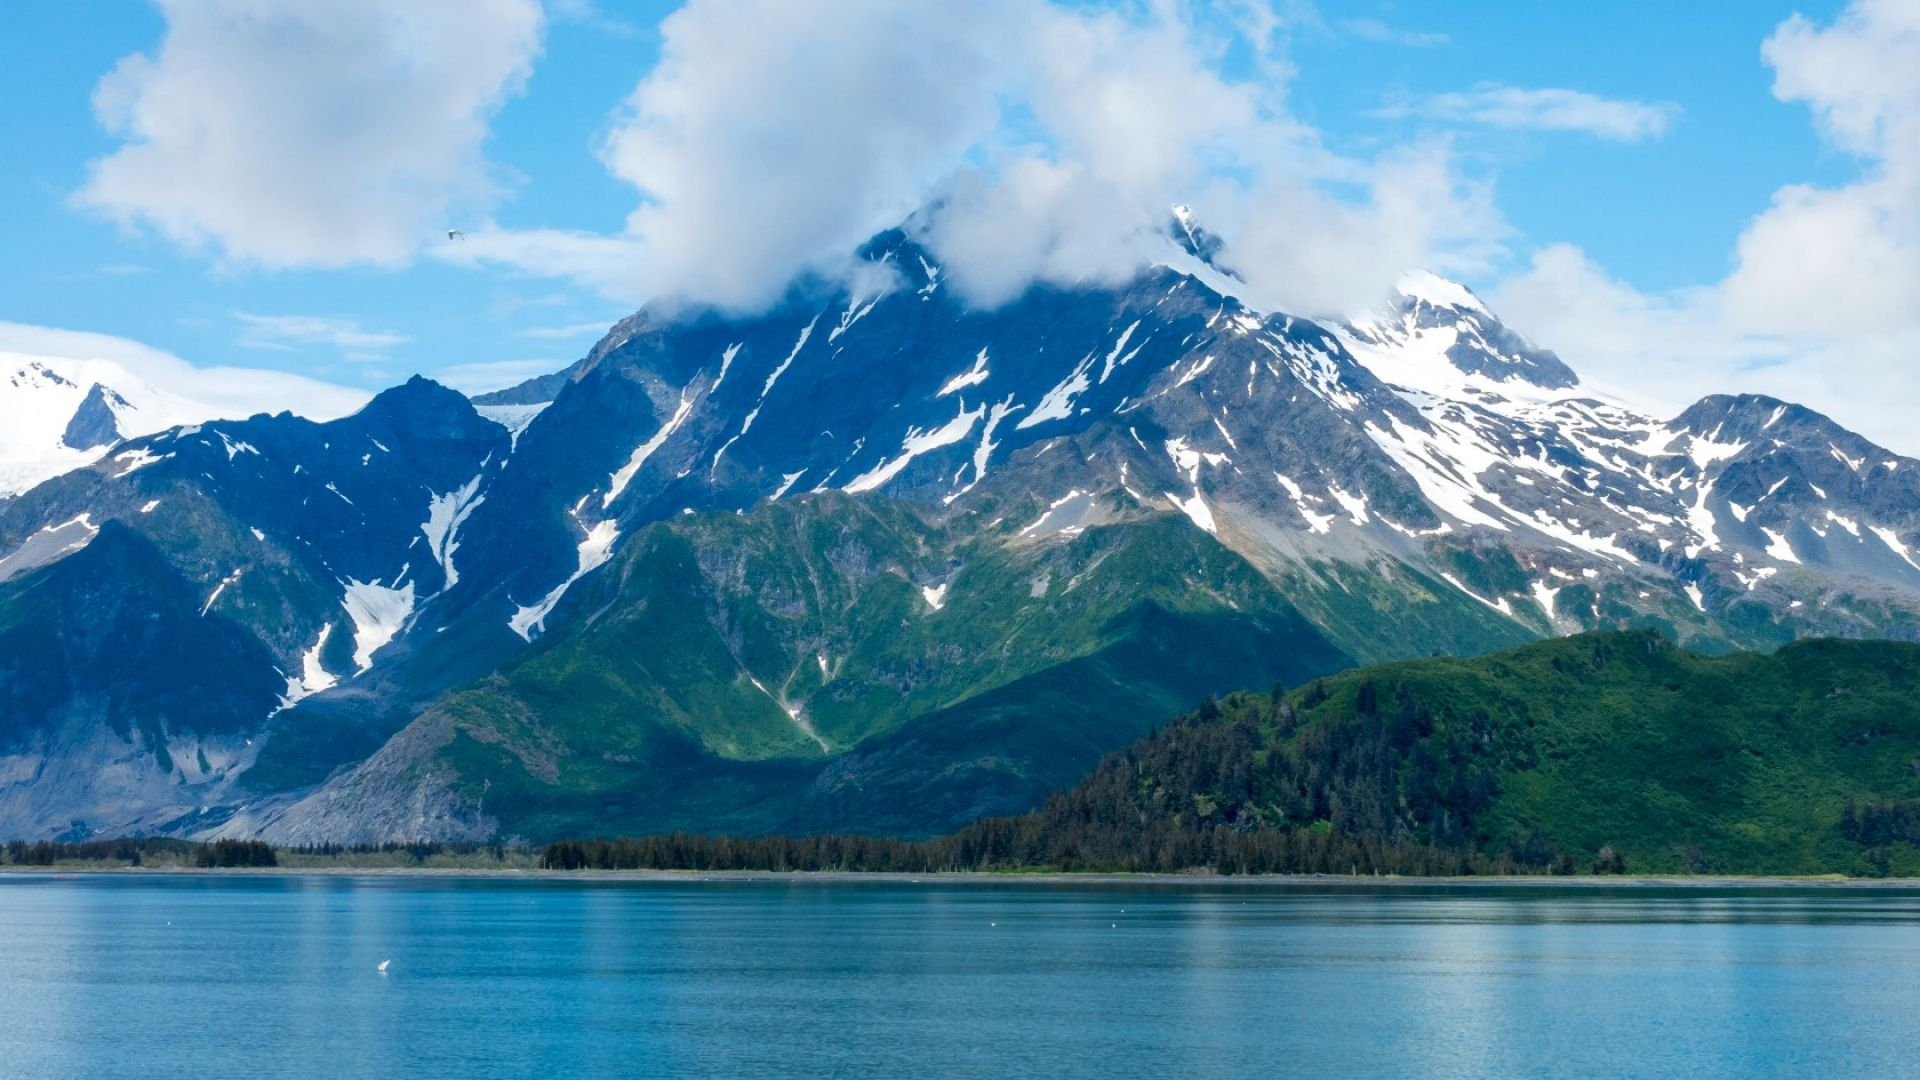 Full HD 1080p Alaska Wallpapers HD, Desktop Backgrounds 1920x1080 ... | Desktop backgrounds in ...